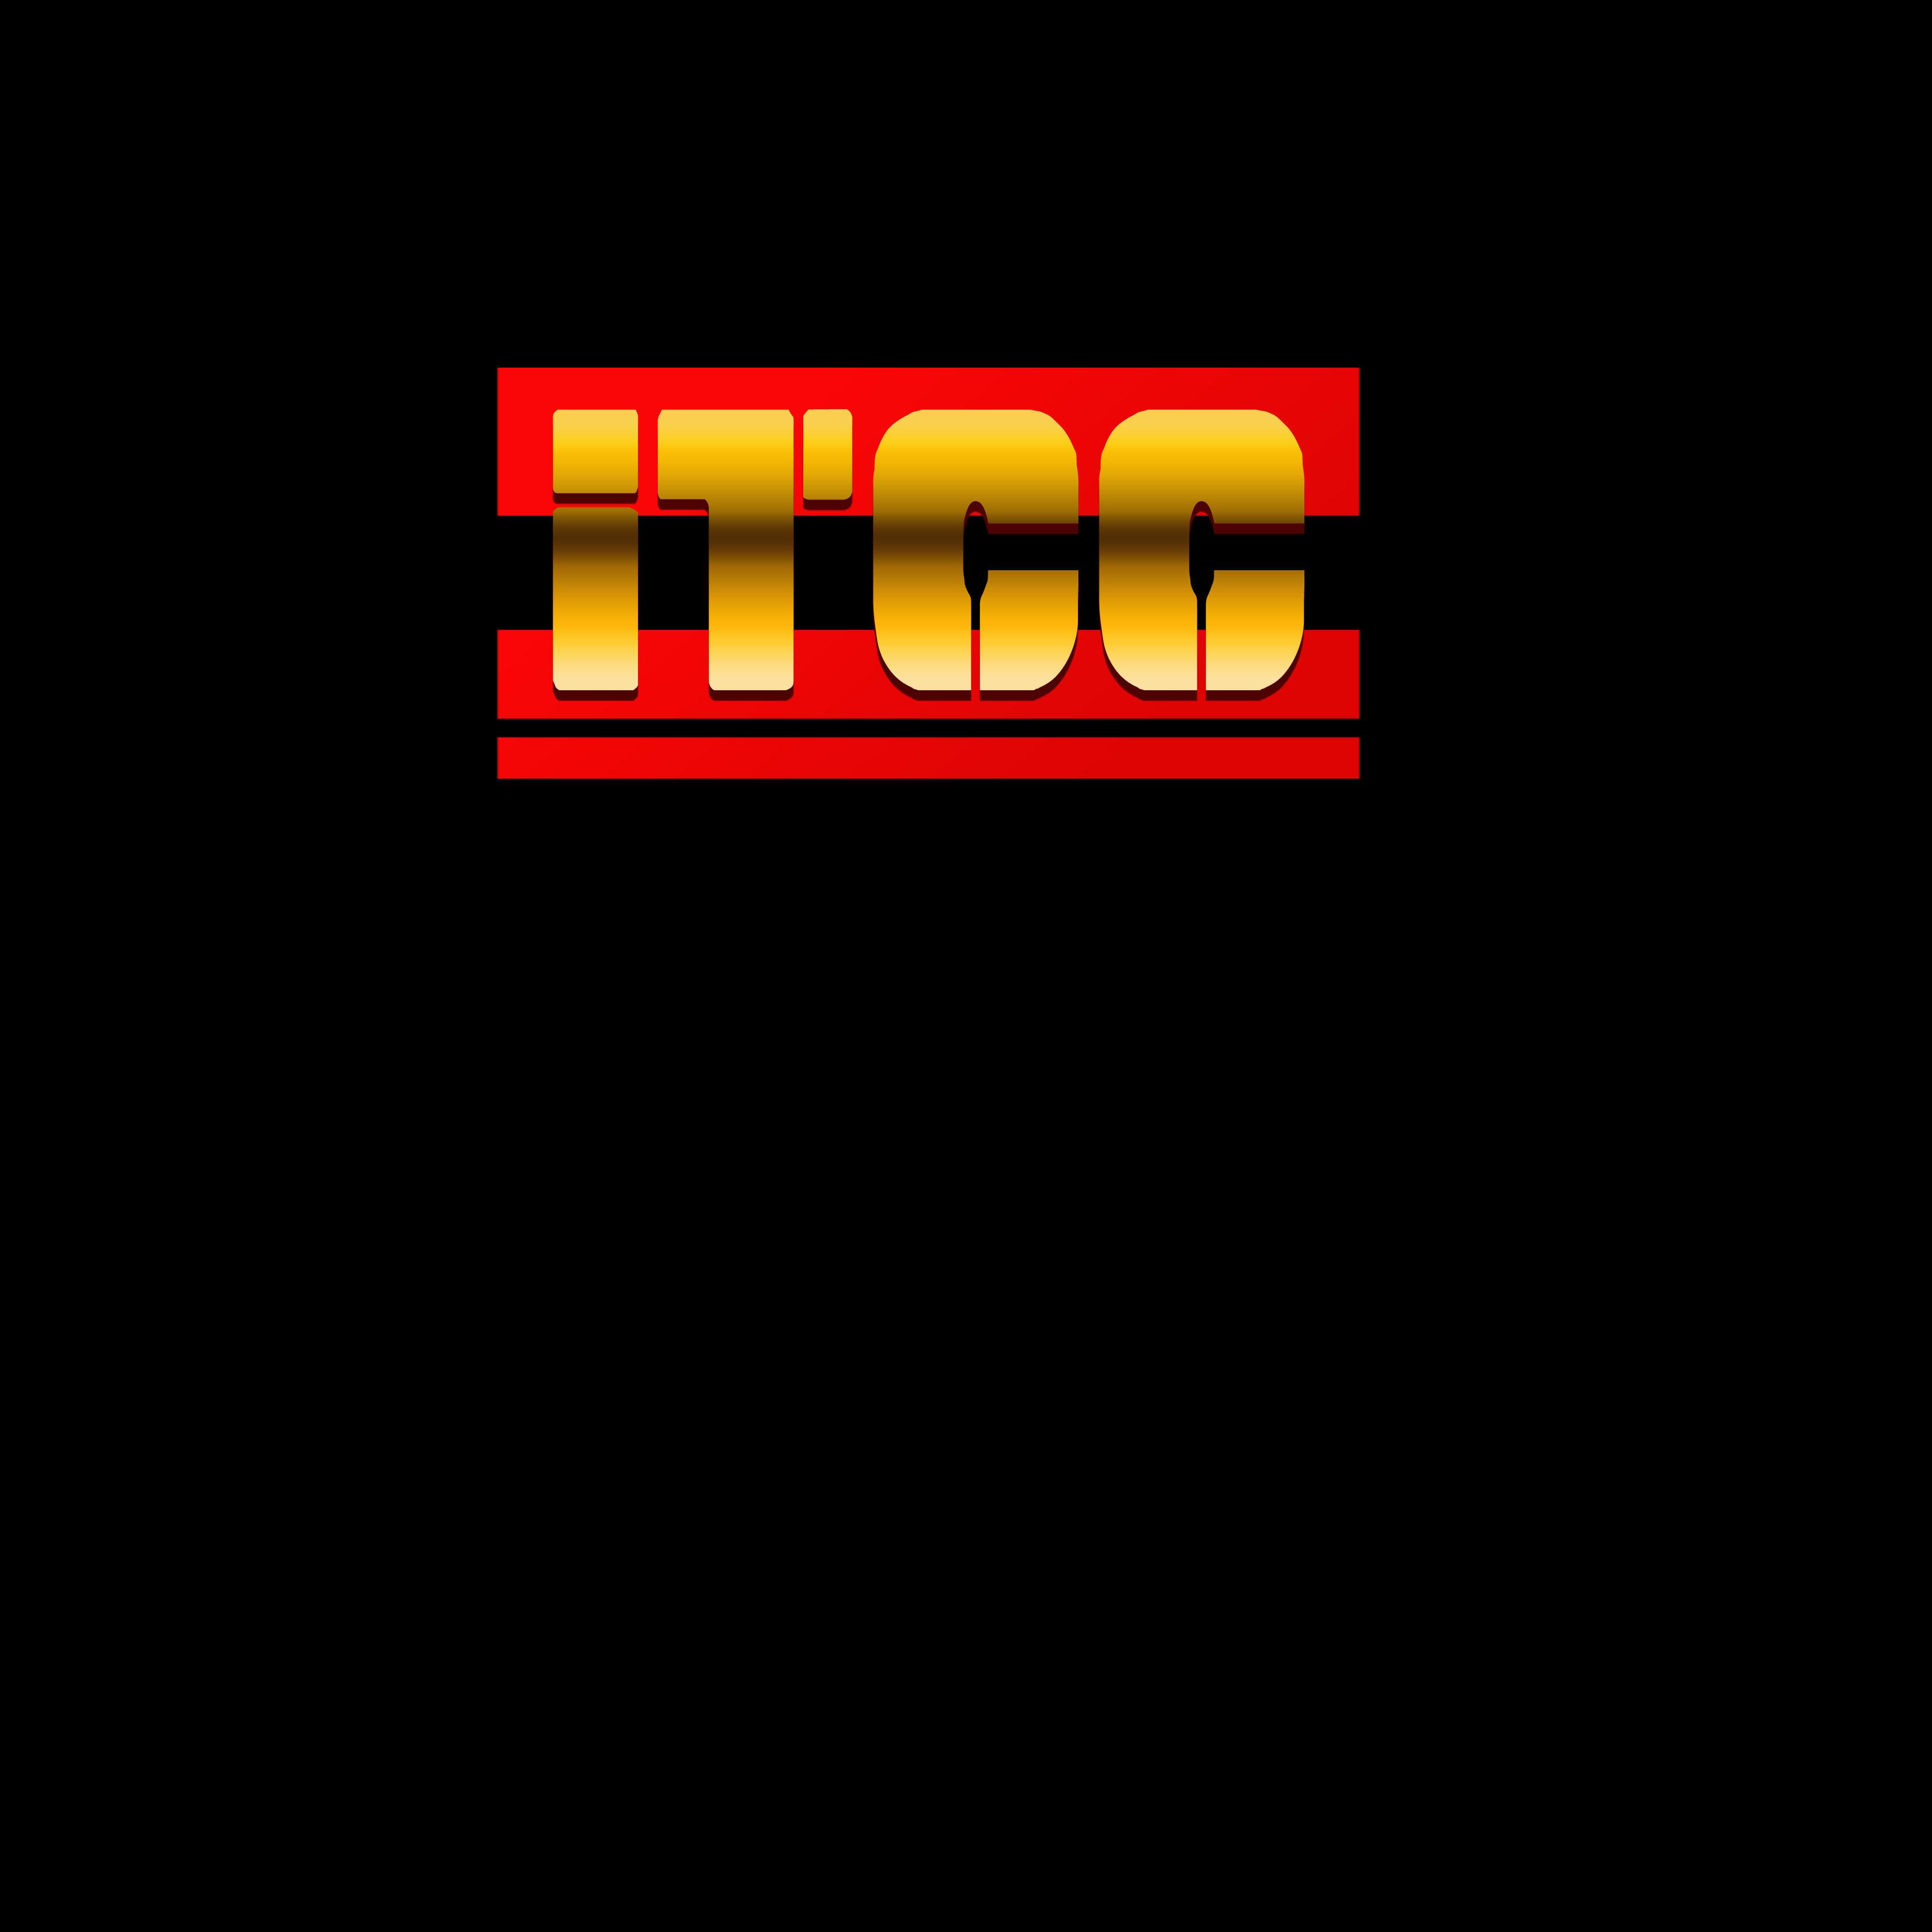 Logo Design by Allan Esclamado - Entry No. 166 in the Logo Design Contest Inspiring Logo Design for ITCC.